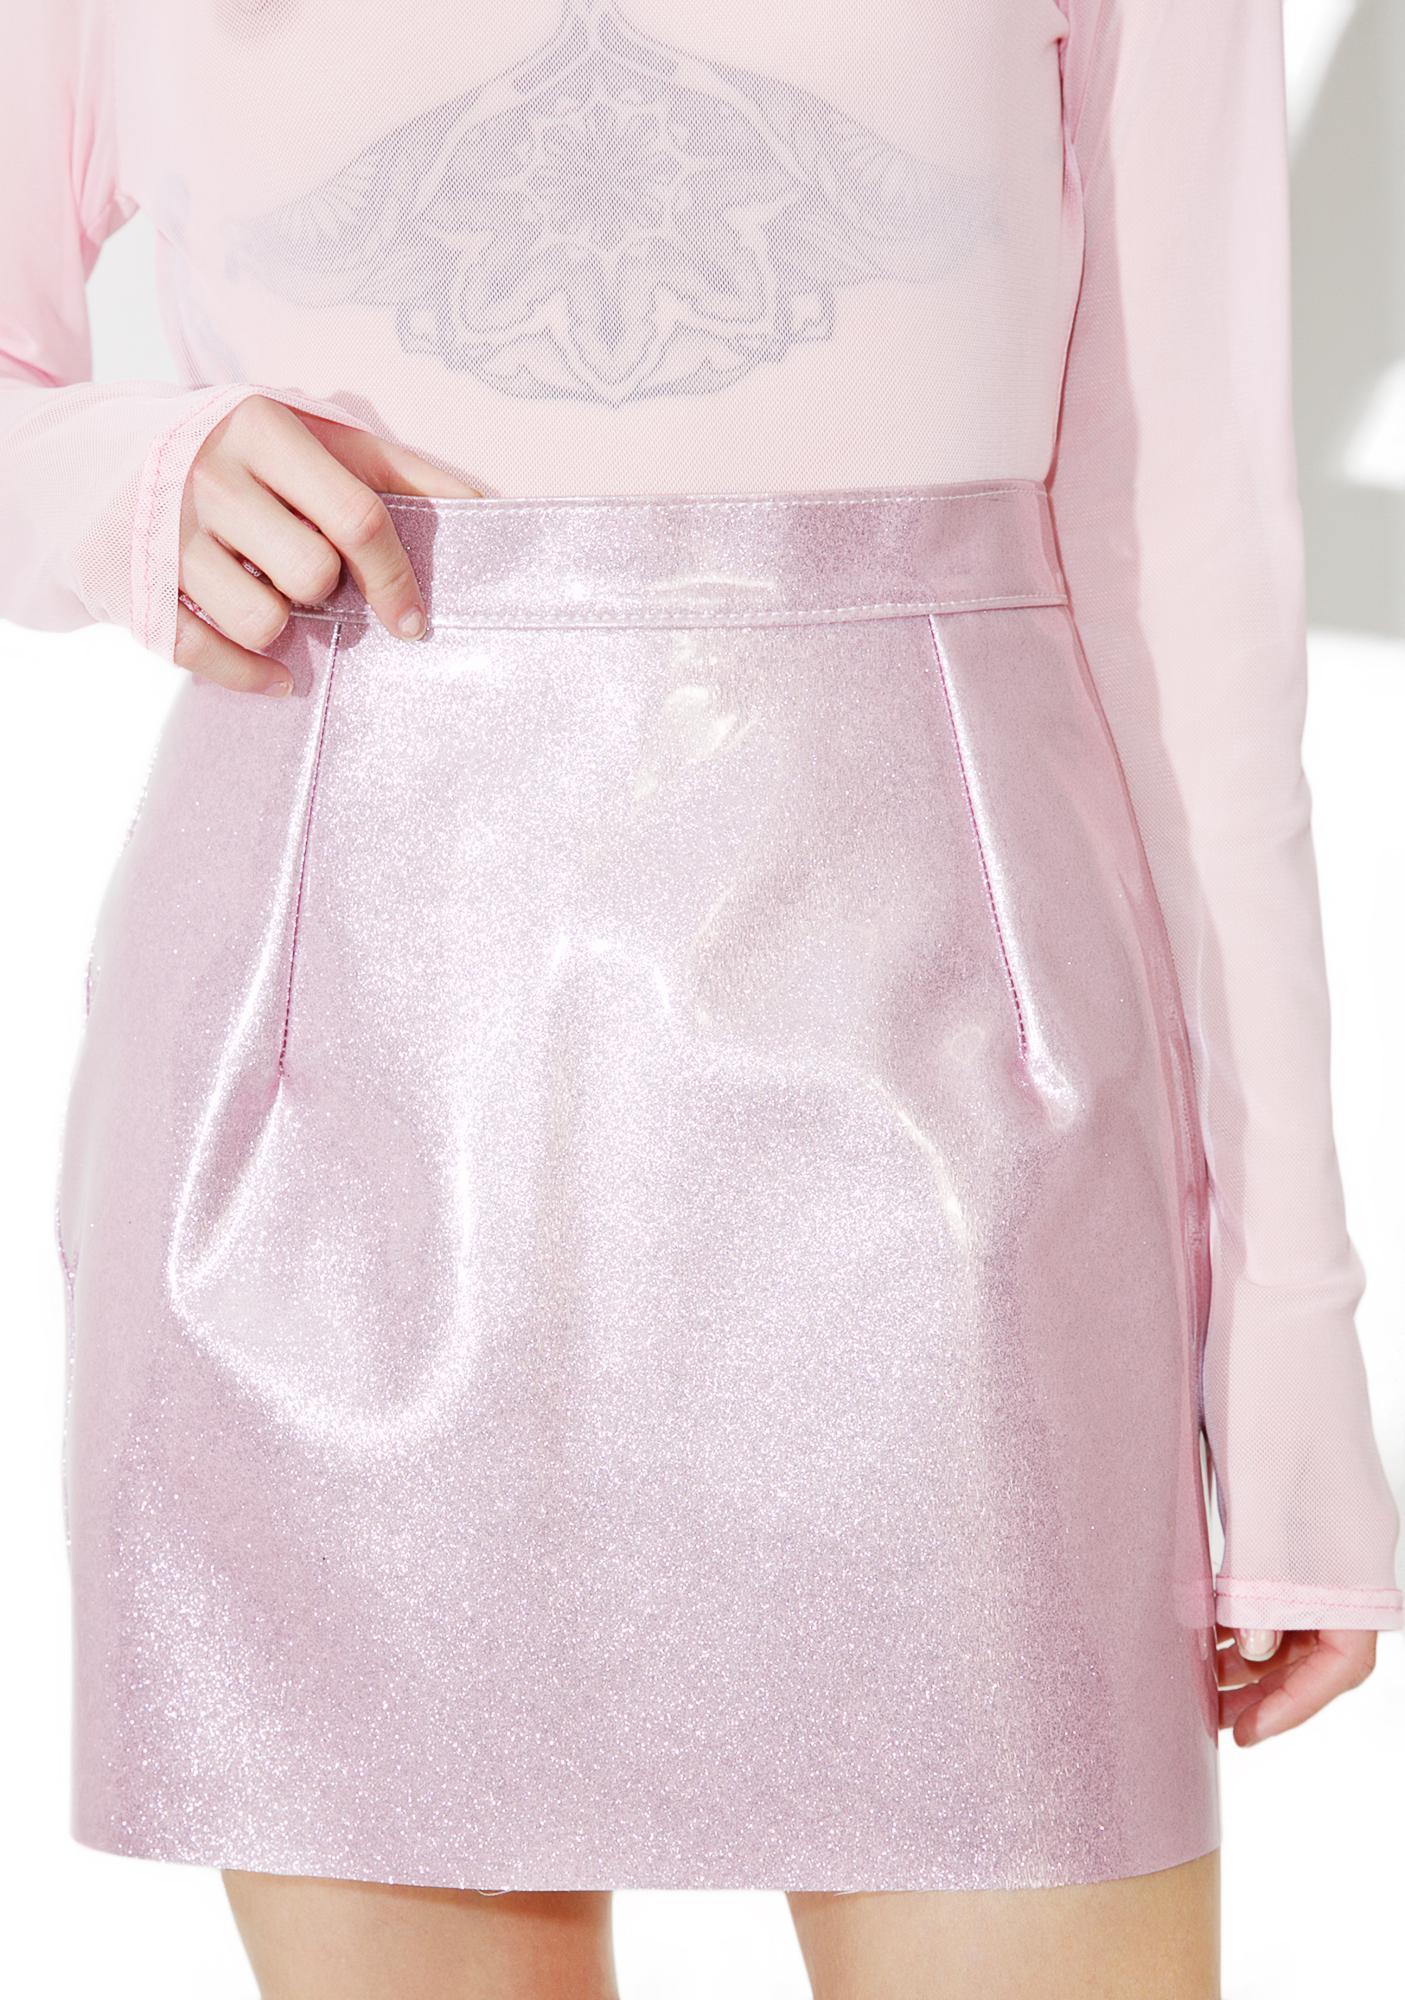 Bunny Holiday Suga BB Vinyl Skirt